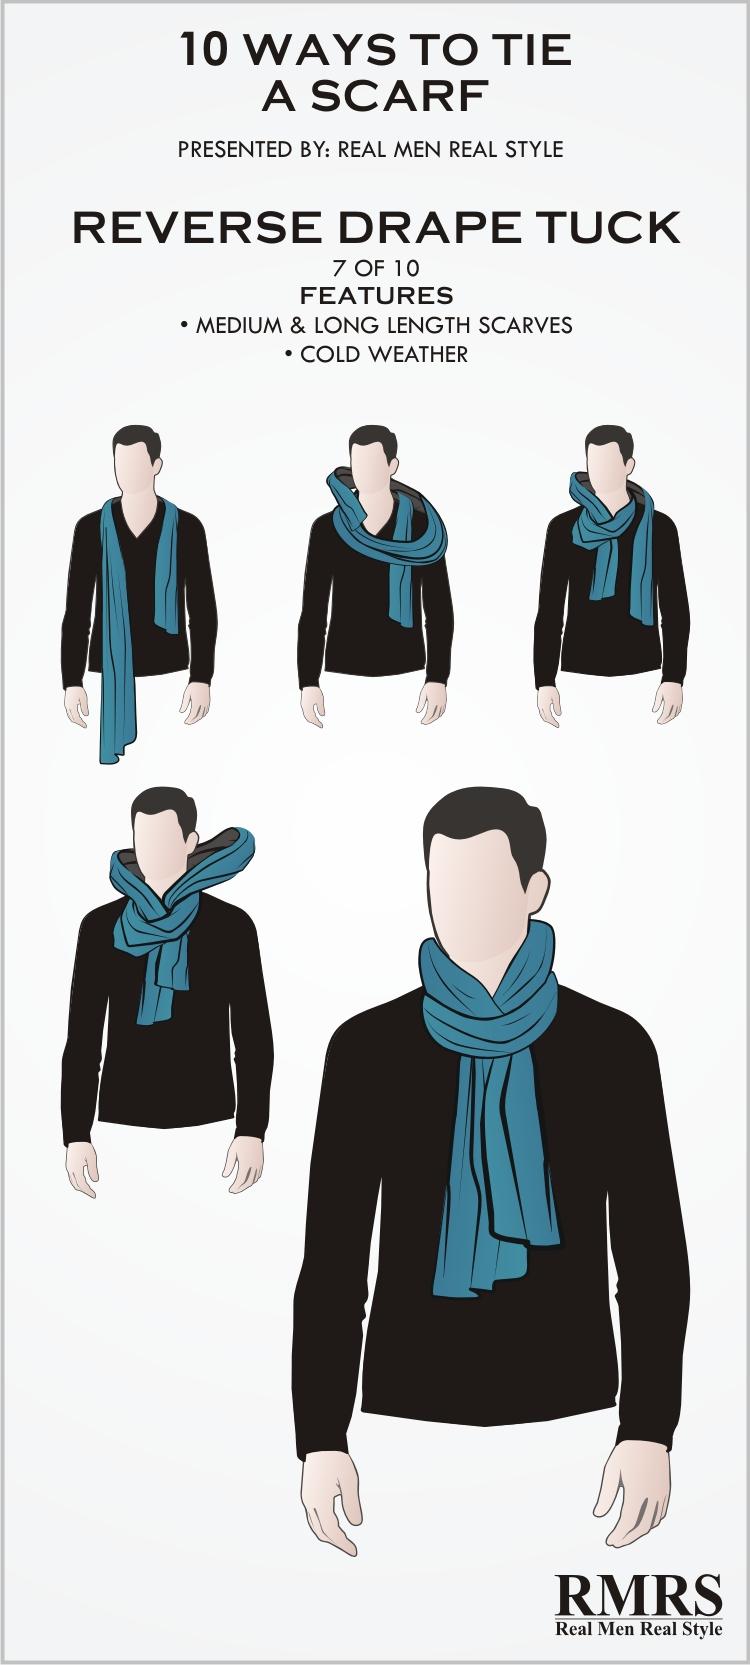 10-ways-to-tie-a-scarf-finall-full-7.jpg